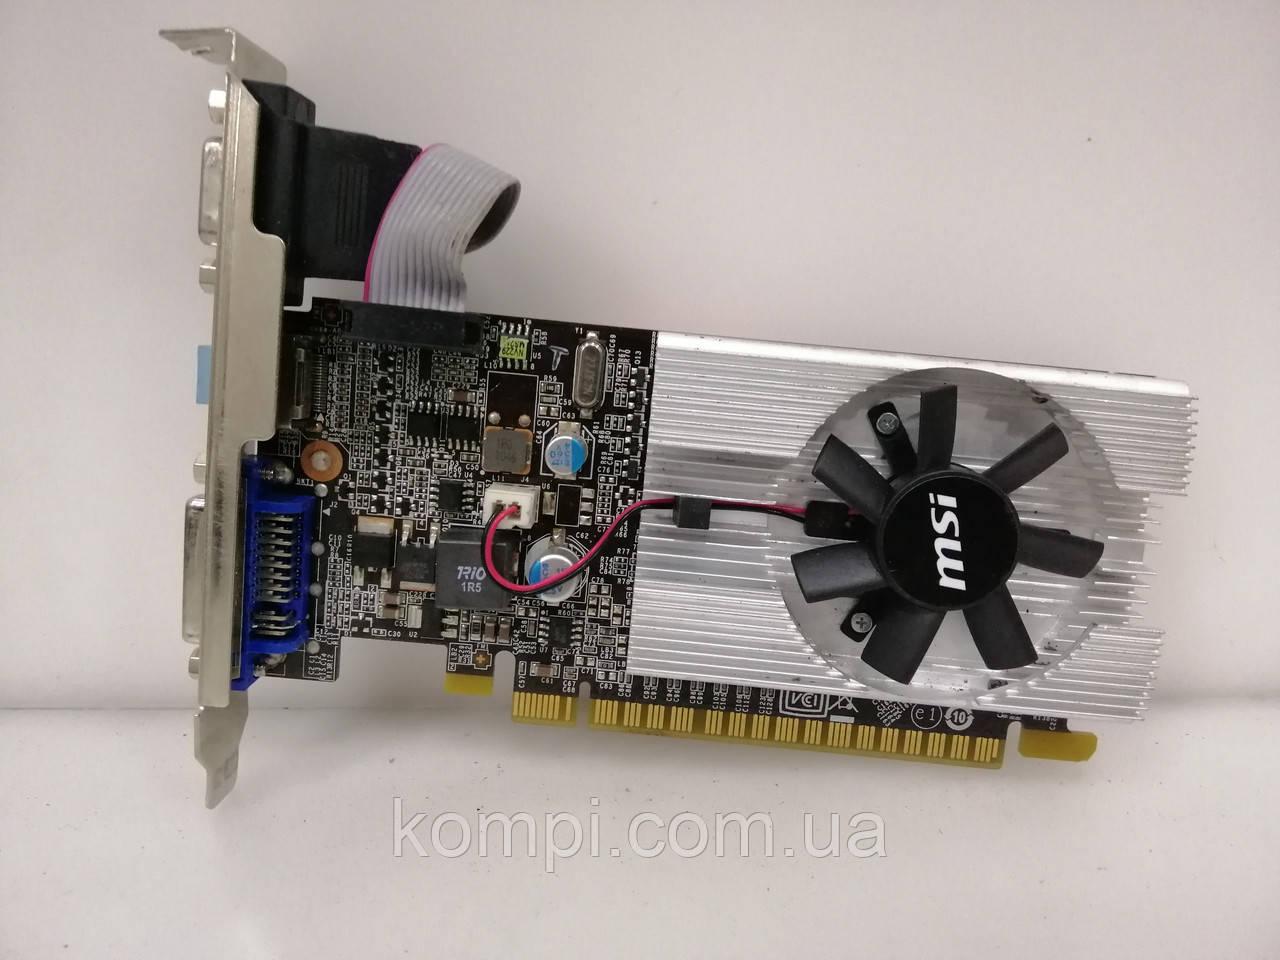 Видеокарта NVIDIA GT 210 1GB PCI-E HDMI